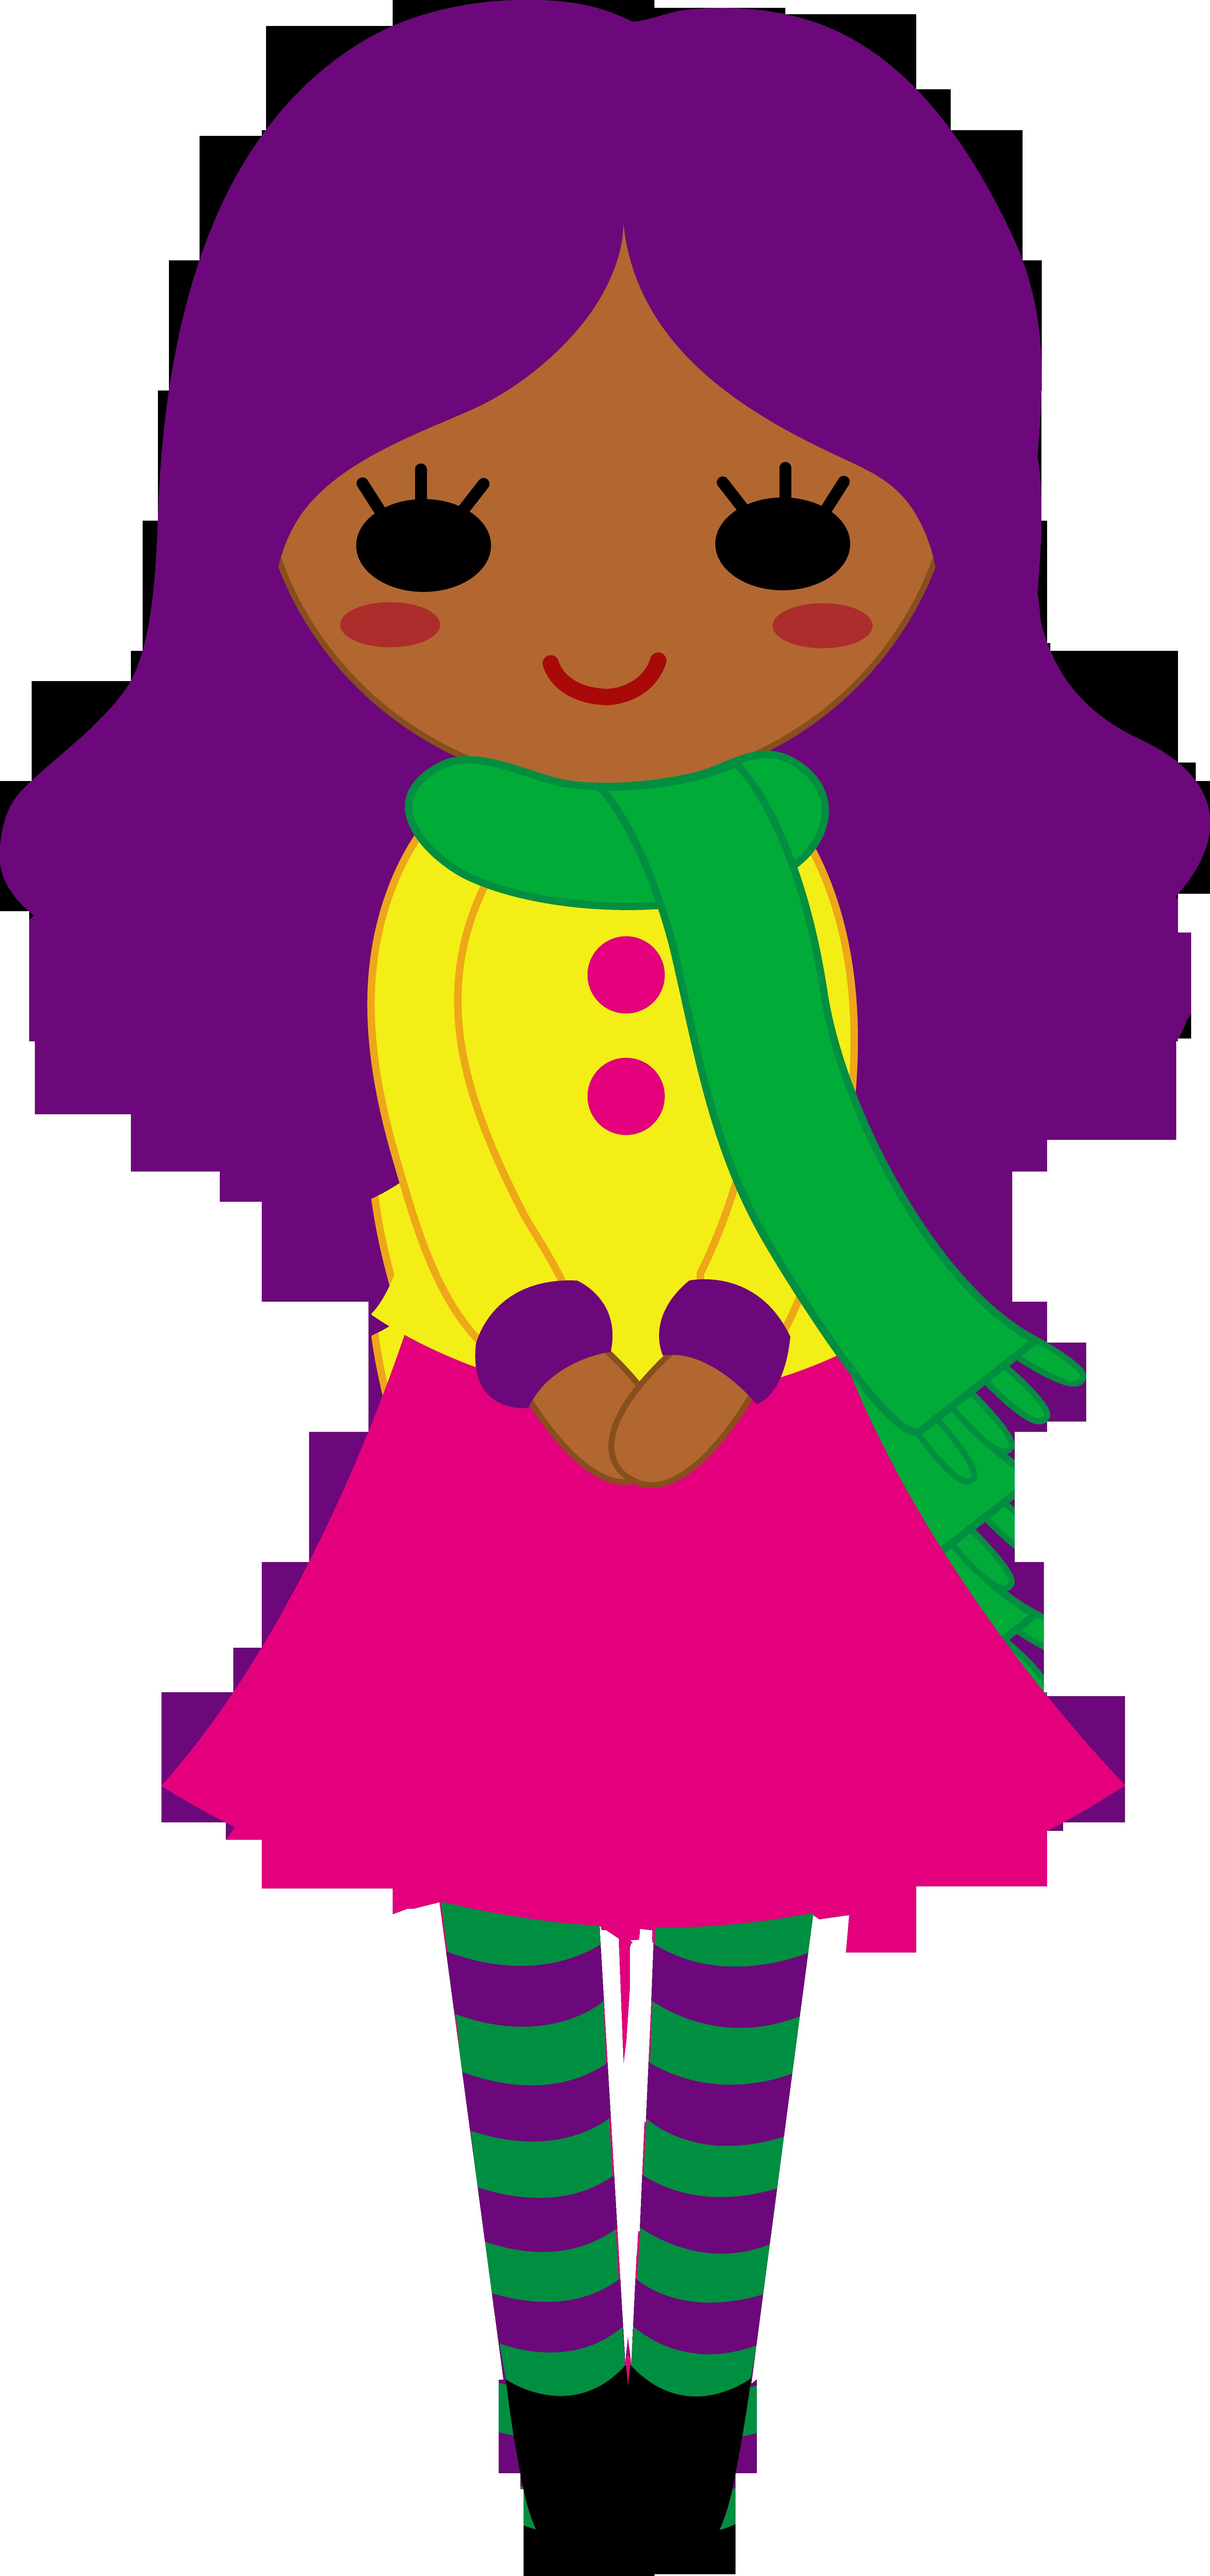 3402x7243 Cute Girl With Purple Hair